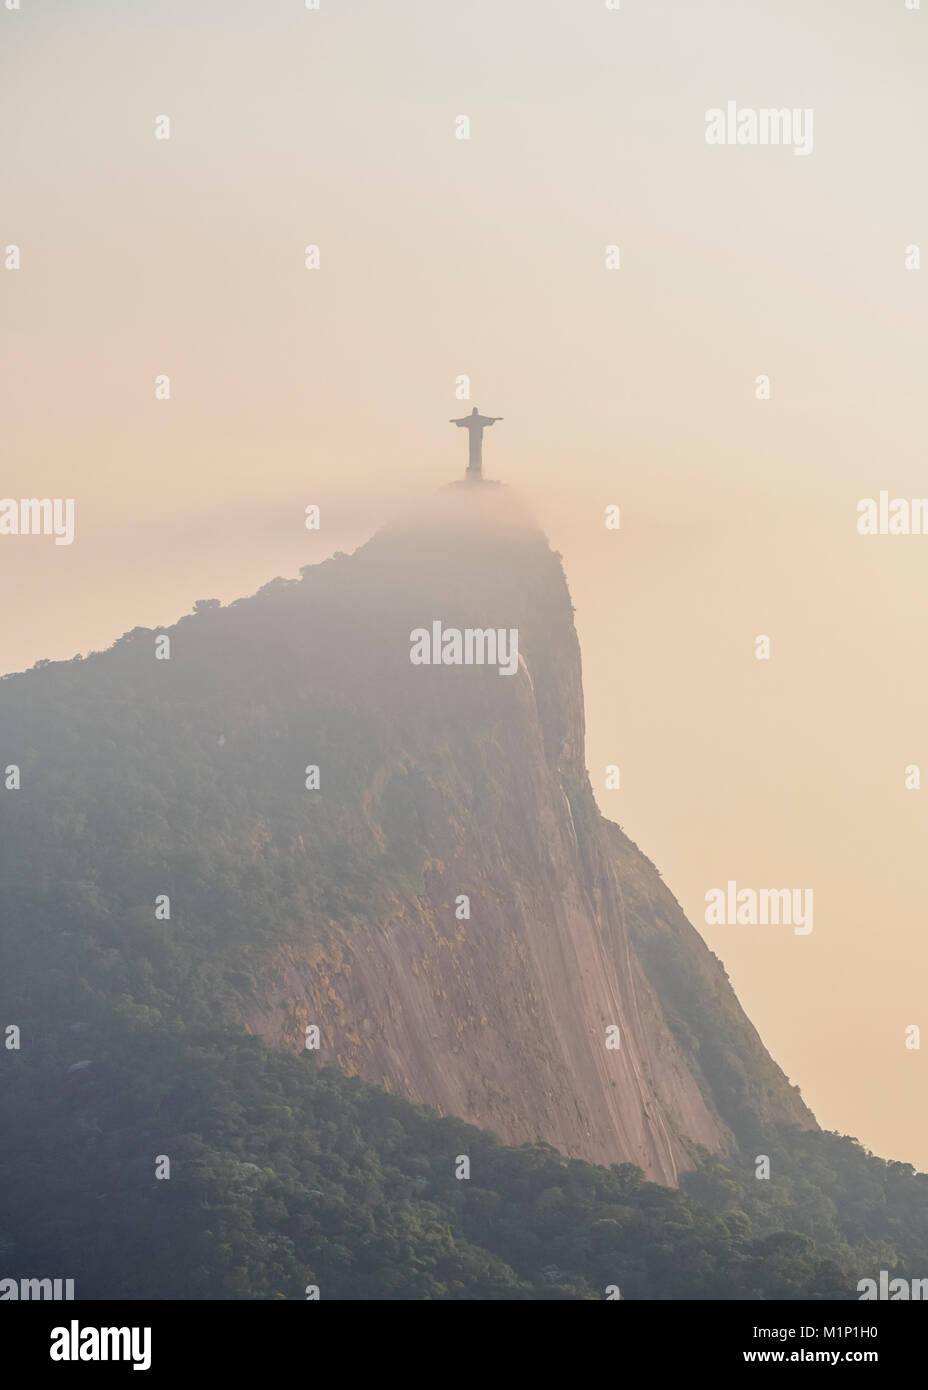 Christ the Redeemer and Corcovado Mountain at sunrise, Rio de Janeiro, Brazil, South America Stock Photo